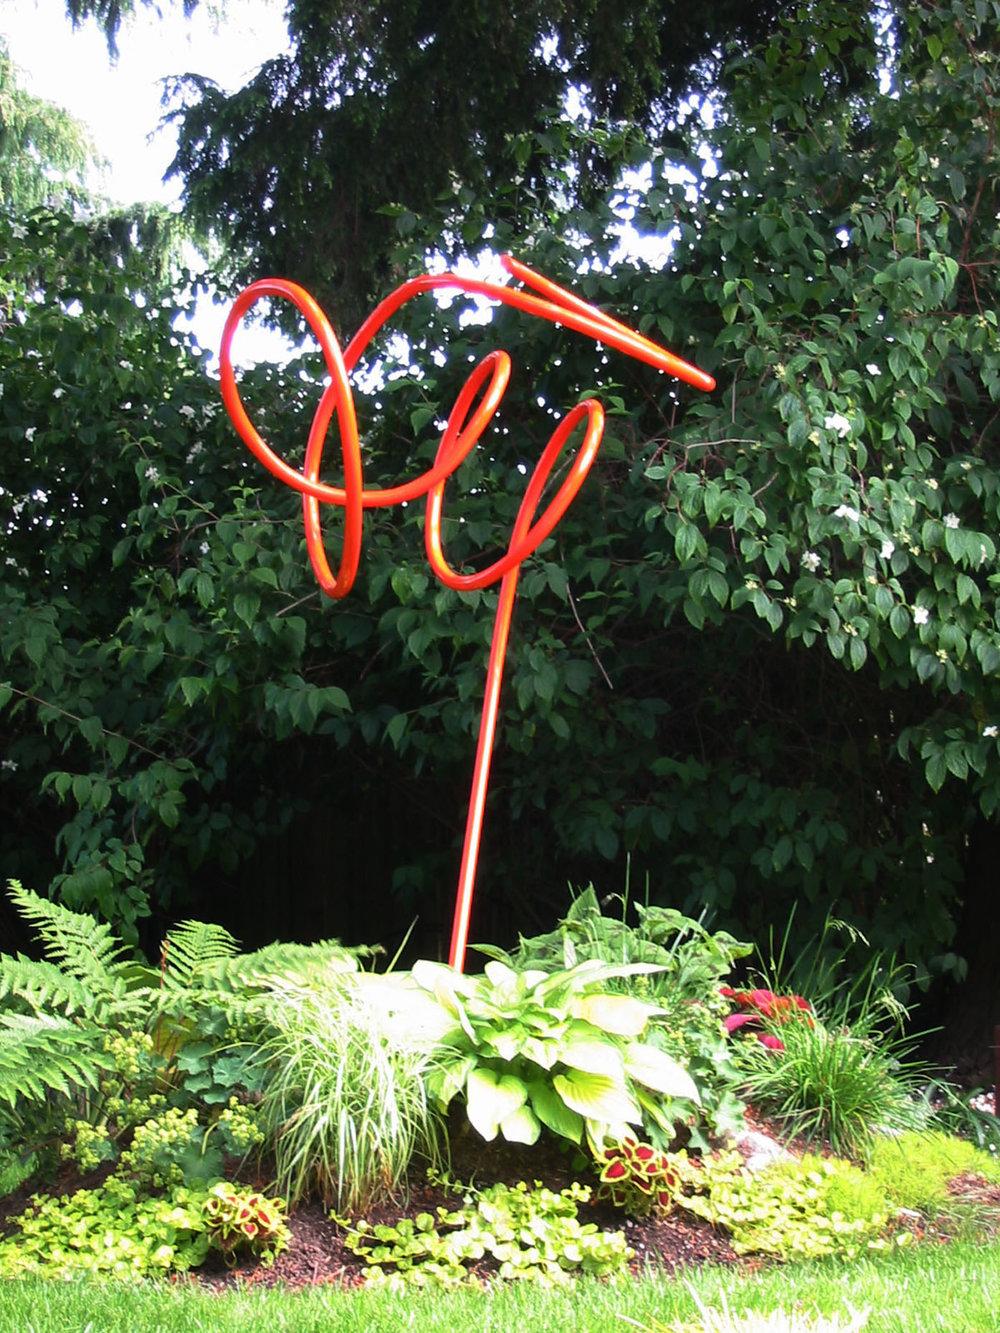 modfountain-sculptures-los-angeles20.jpg